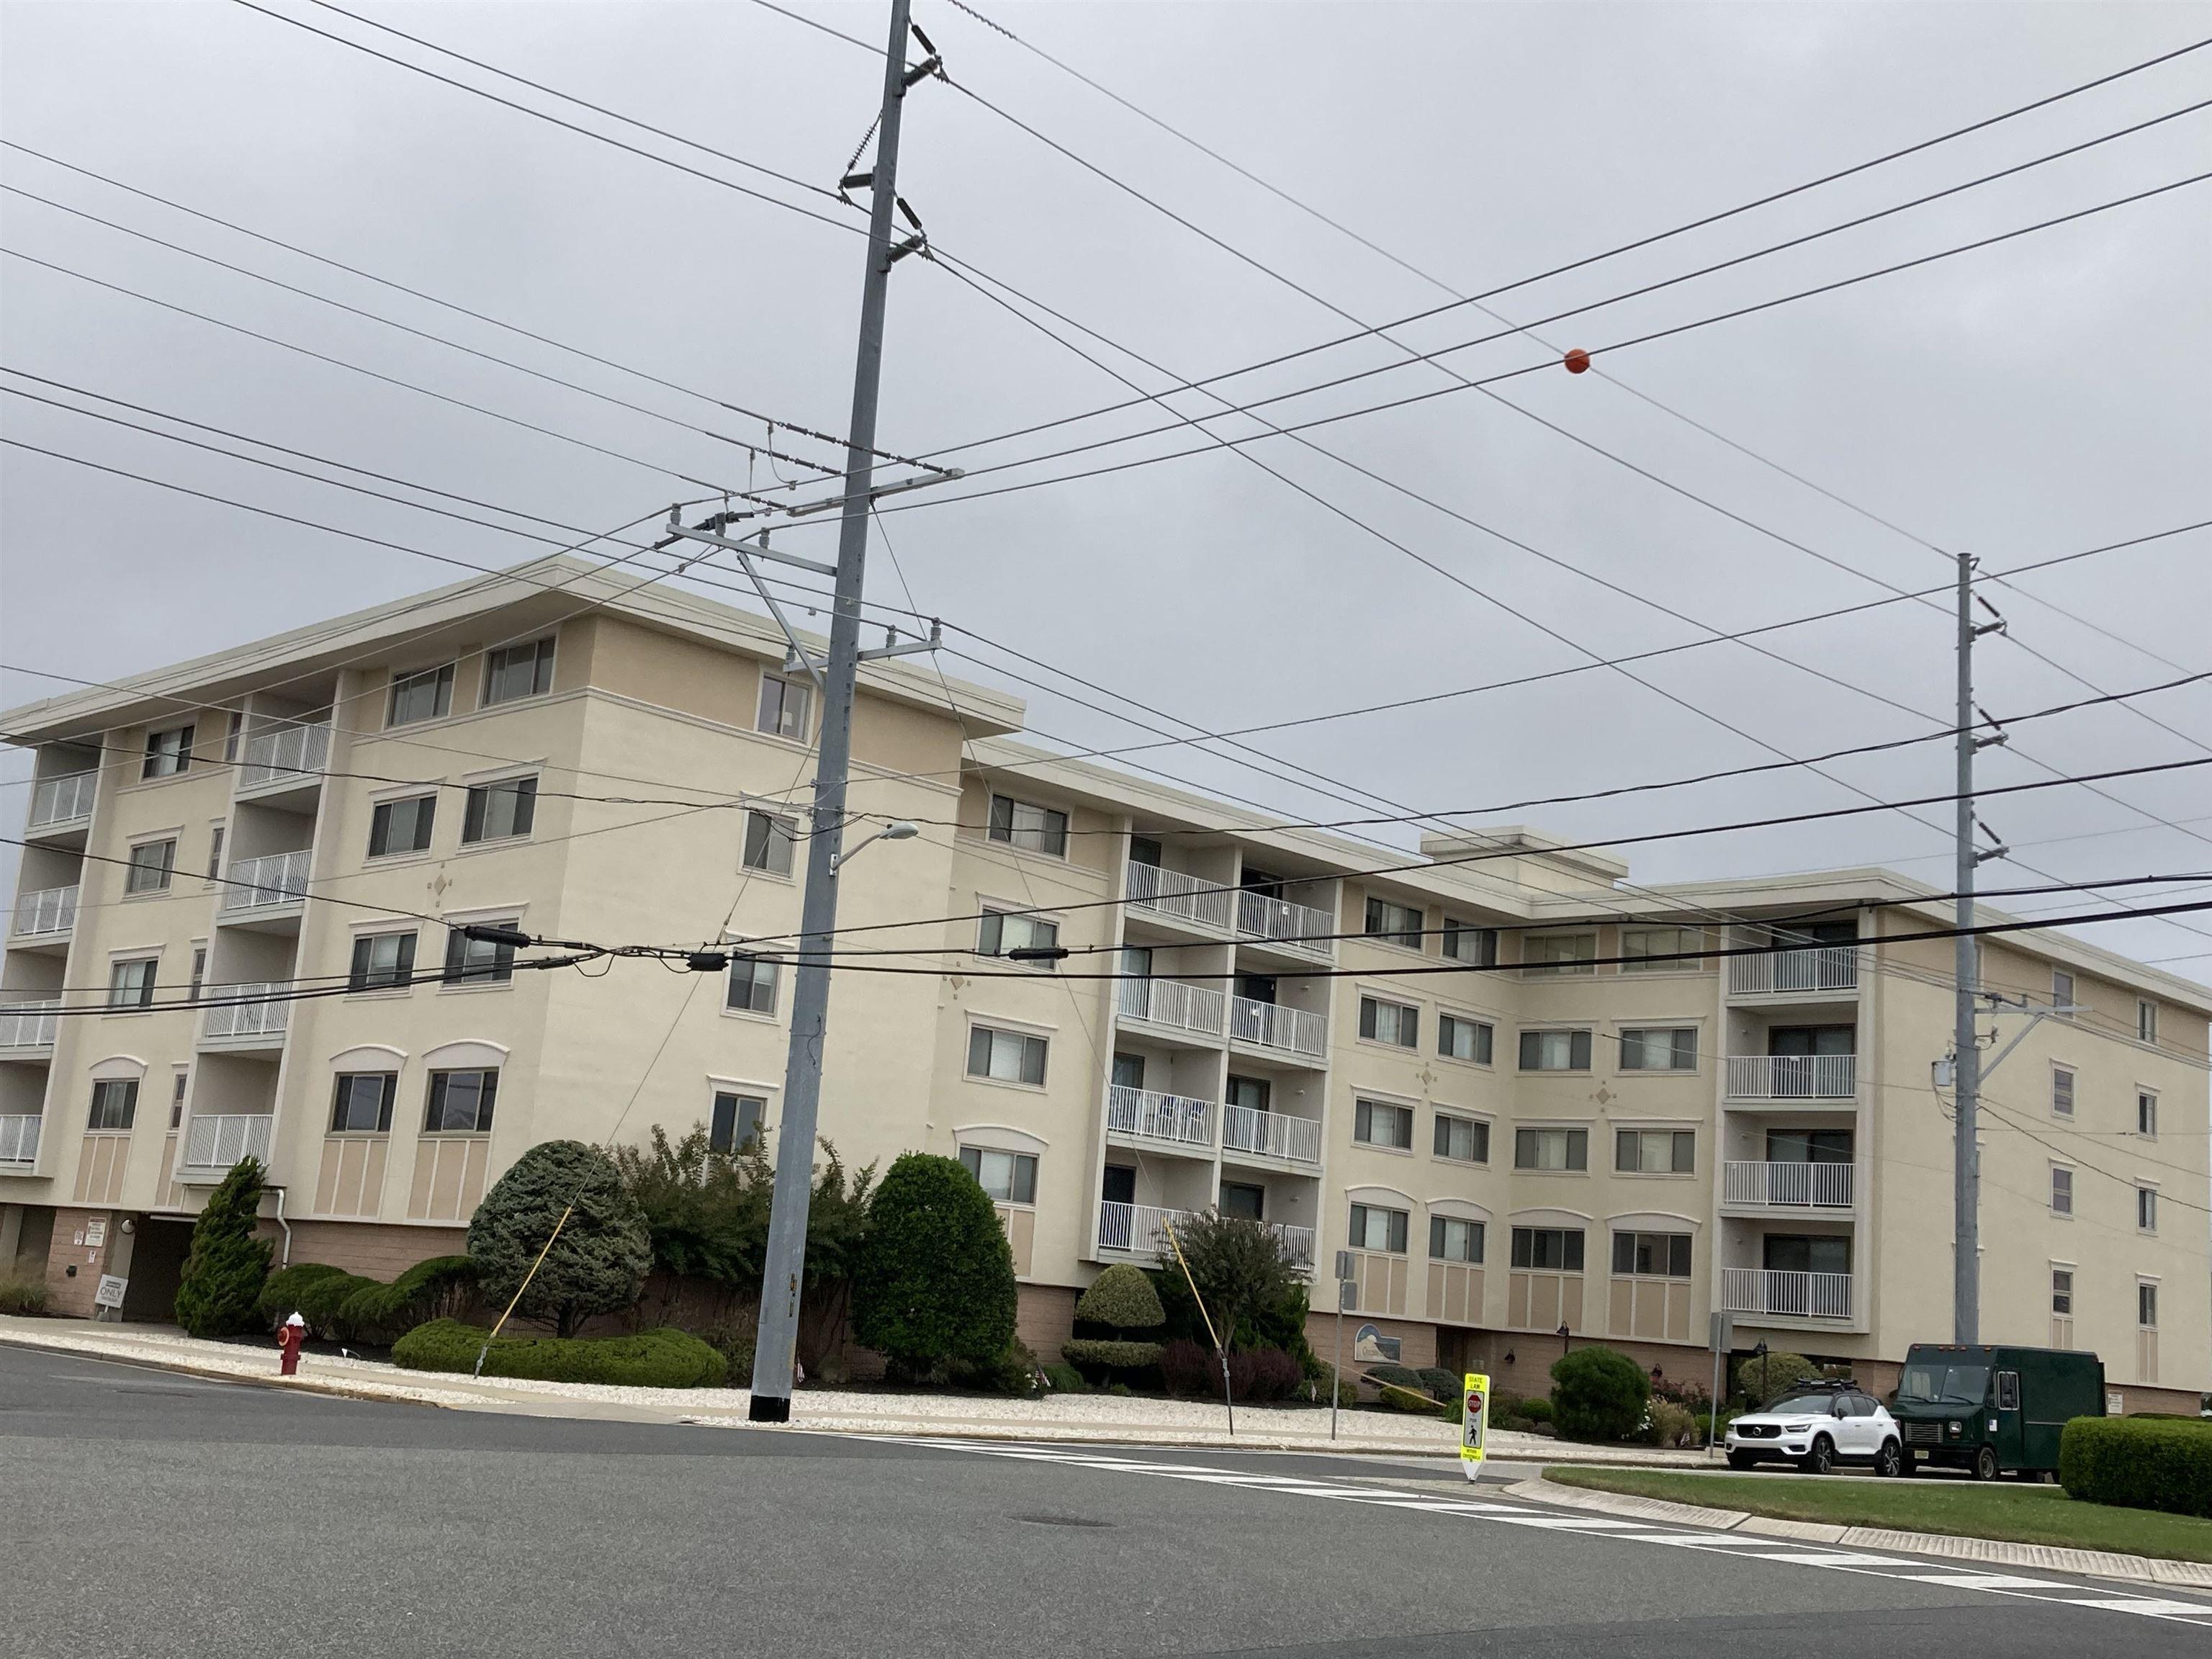 8001 Second Avenue - Stone Harbor